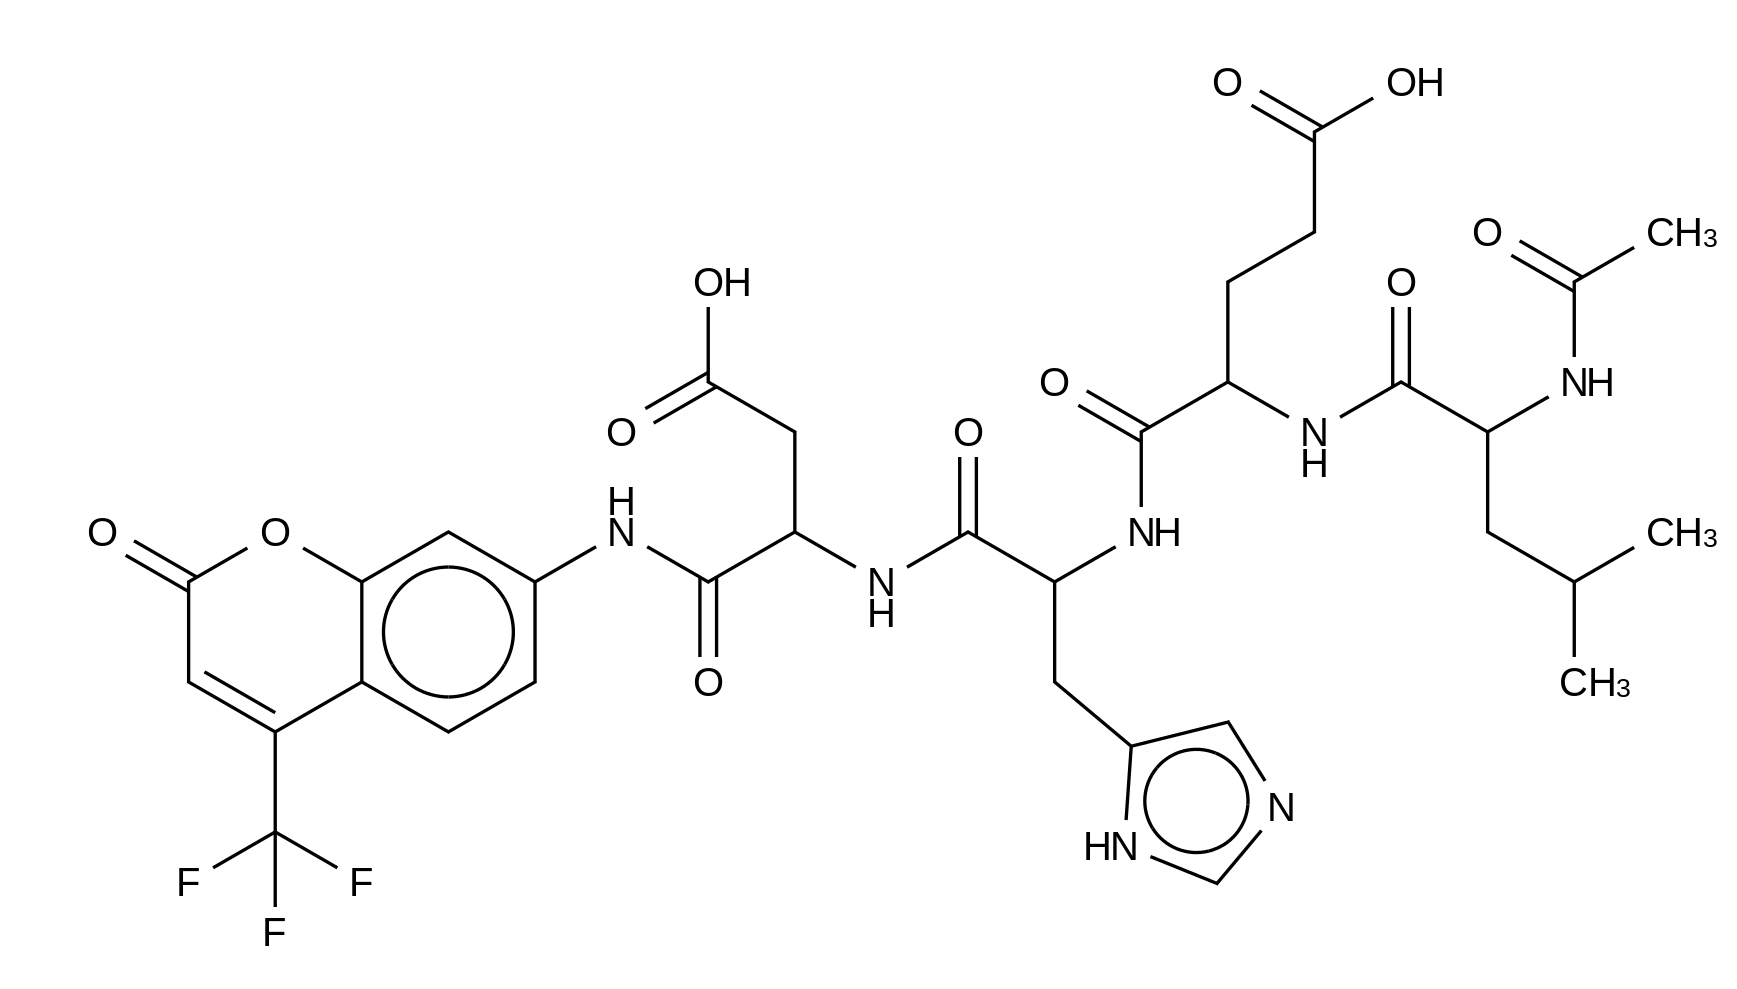 Ac-LEHD-AFC